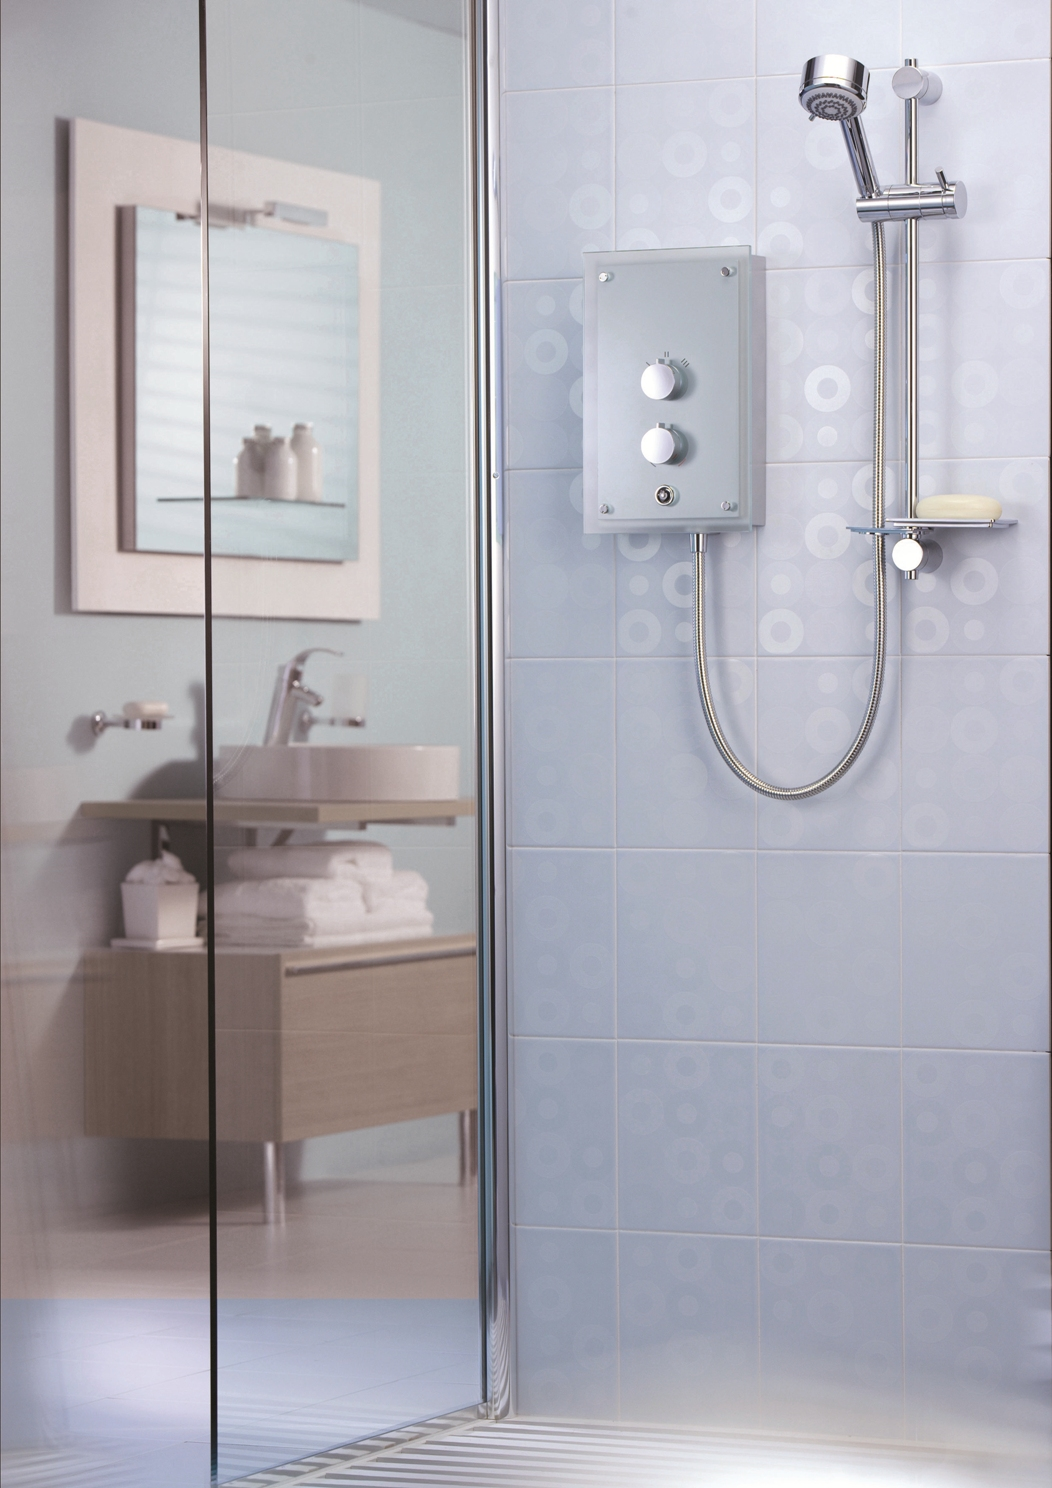 Mira Showers Press Office